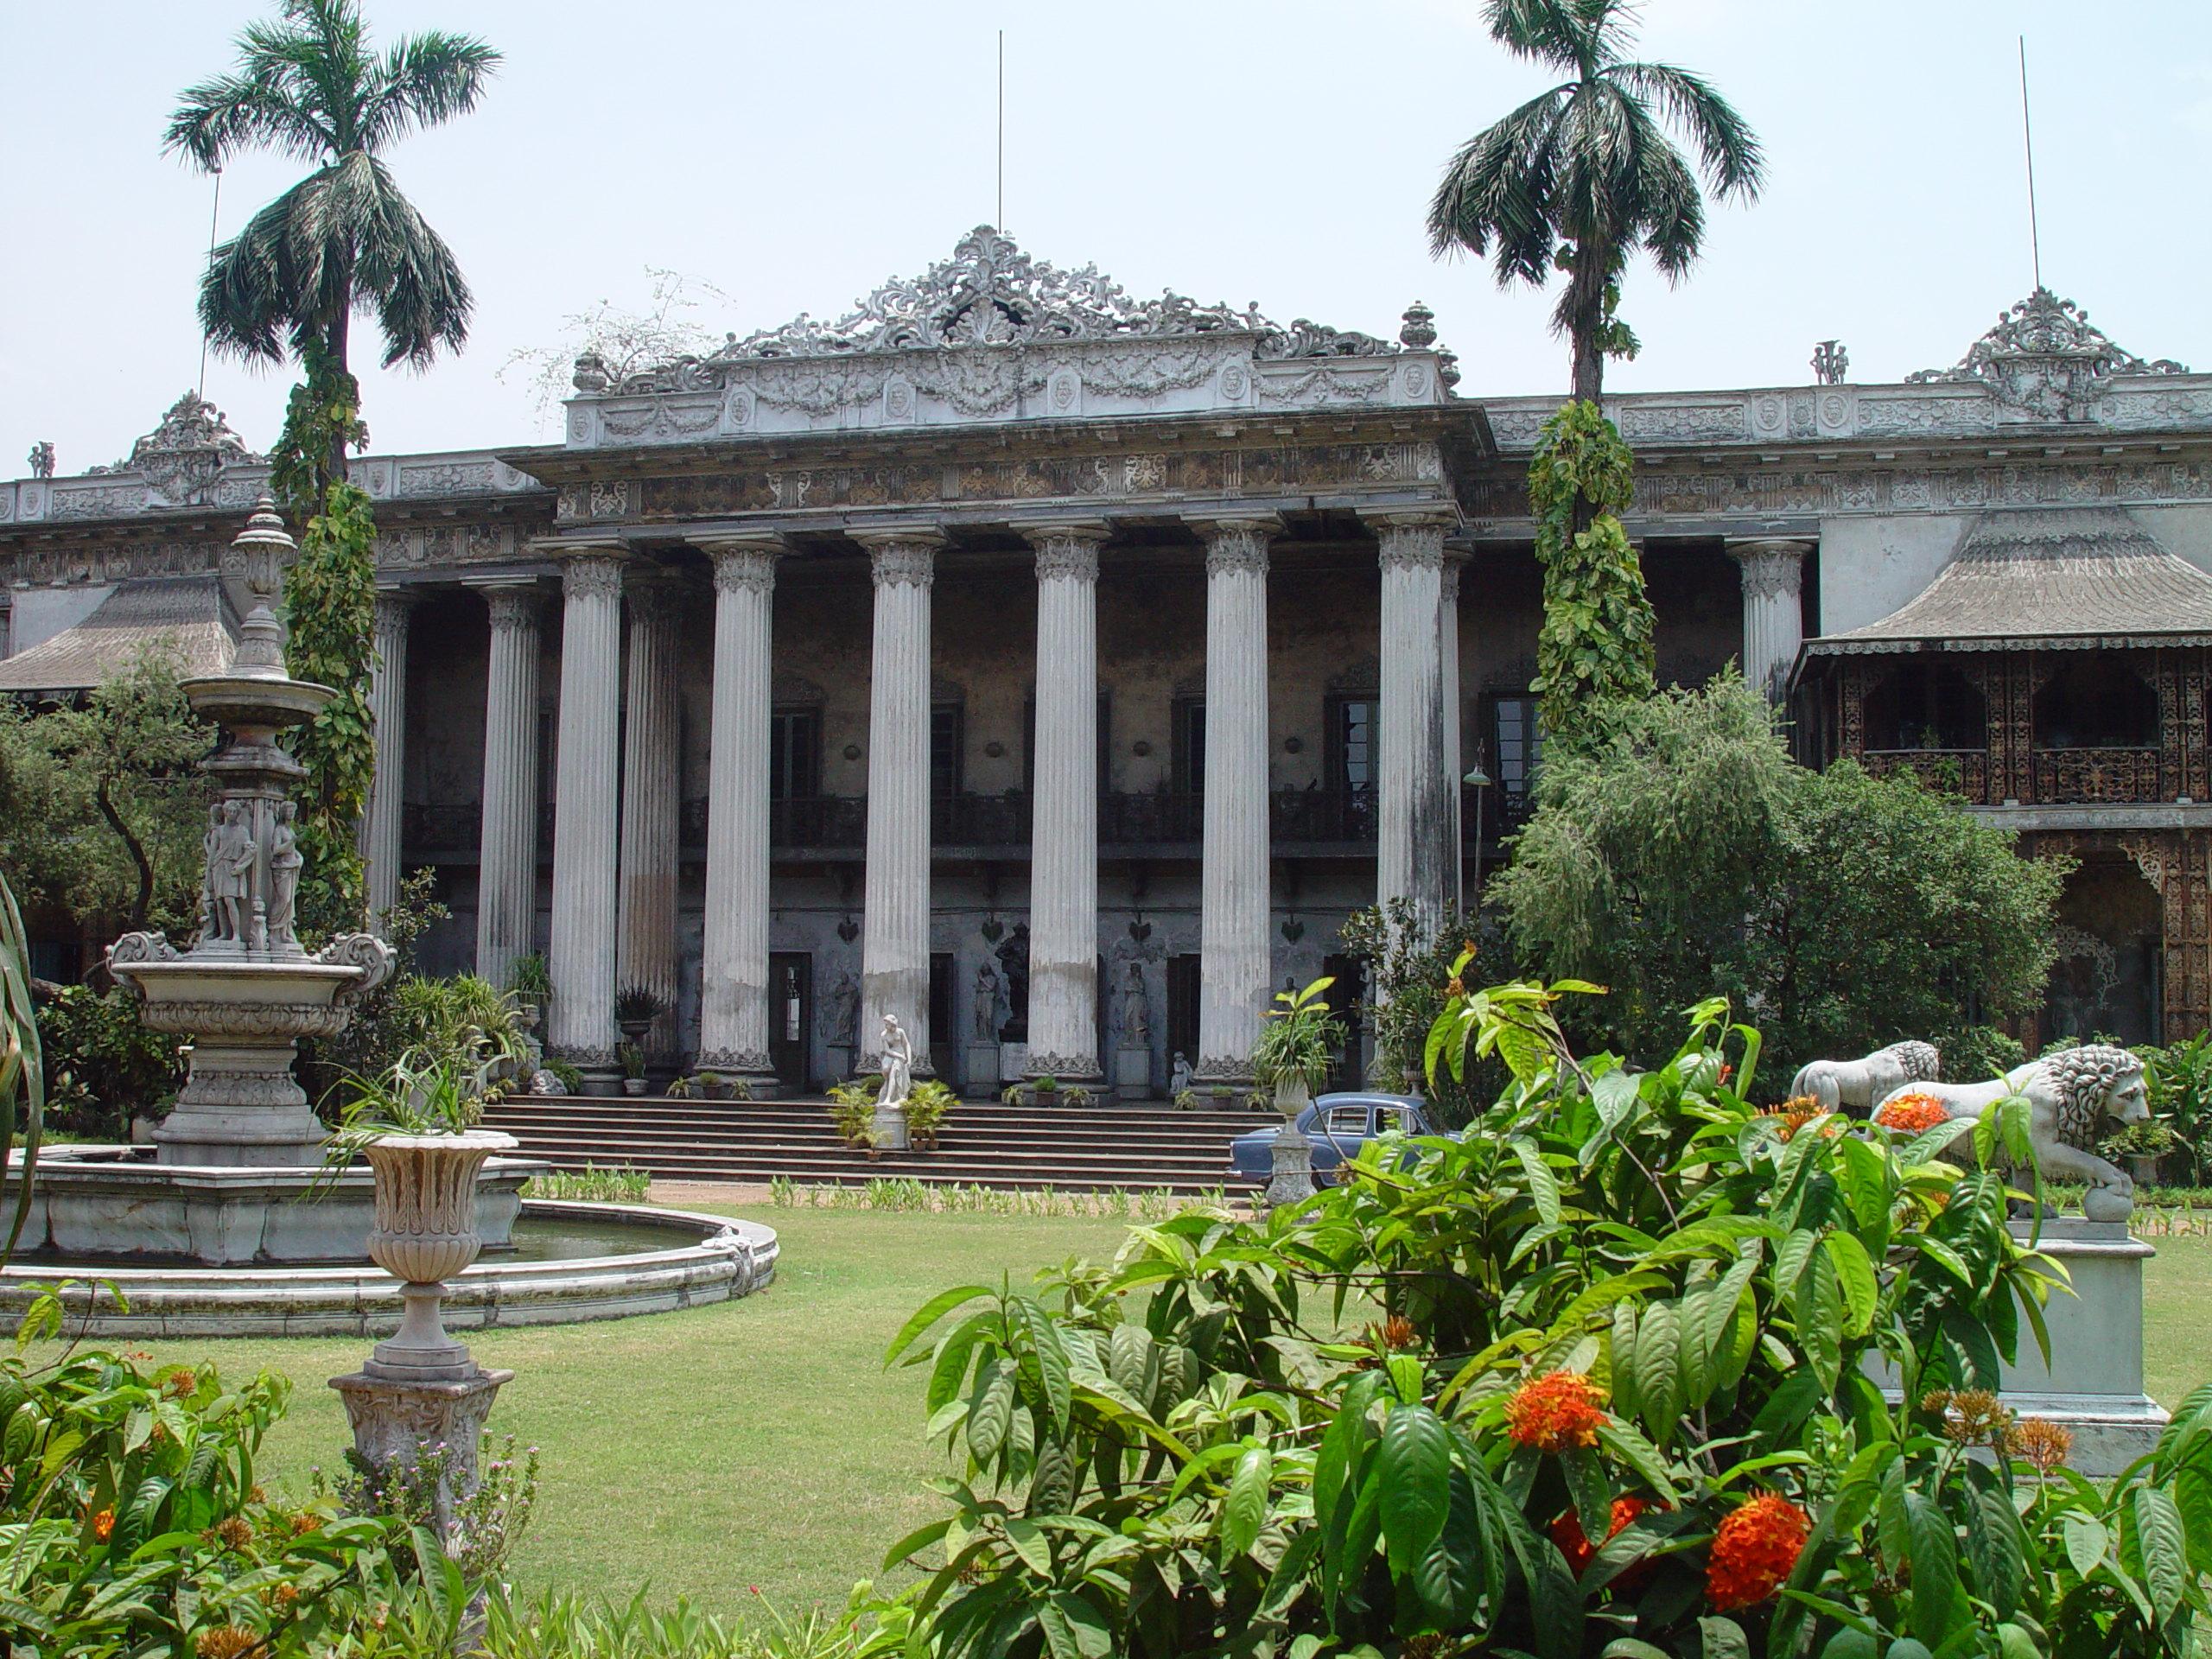 File:Marble Palace Kolkata.jpg - Wikipedia